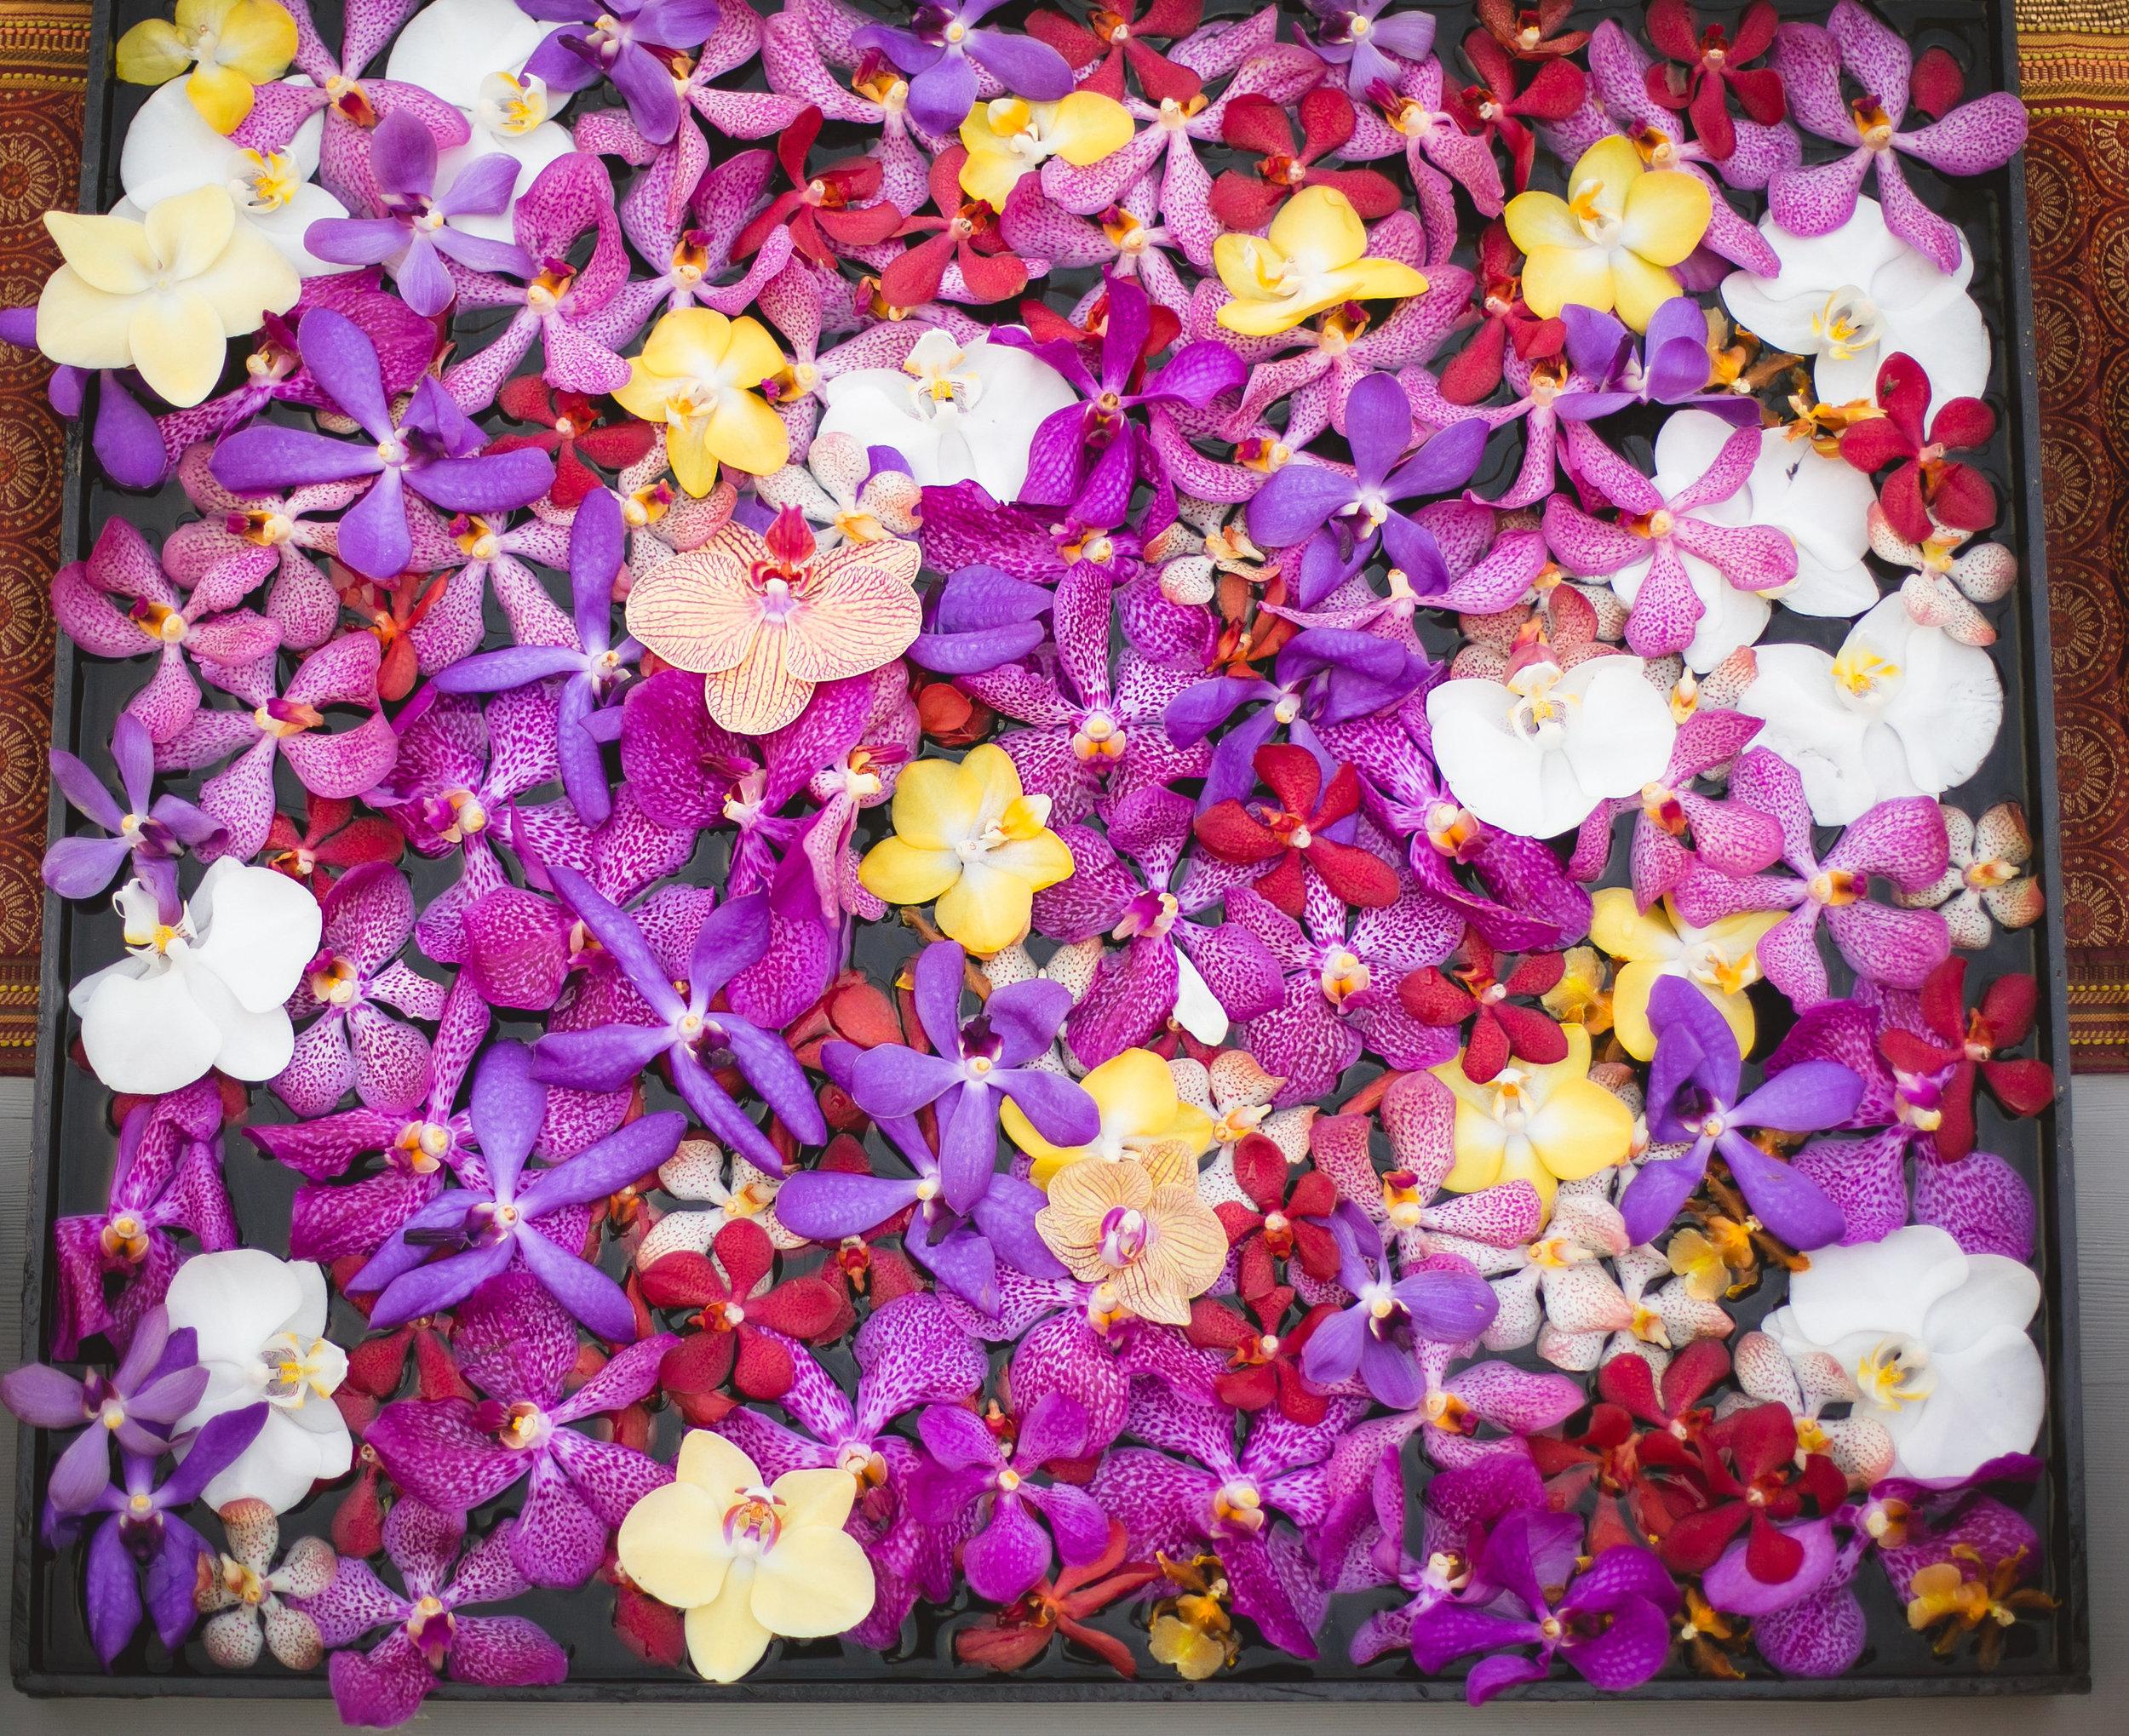 purple orchids.jpg